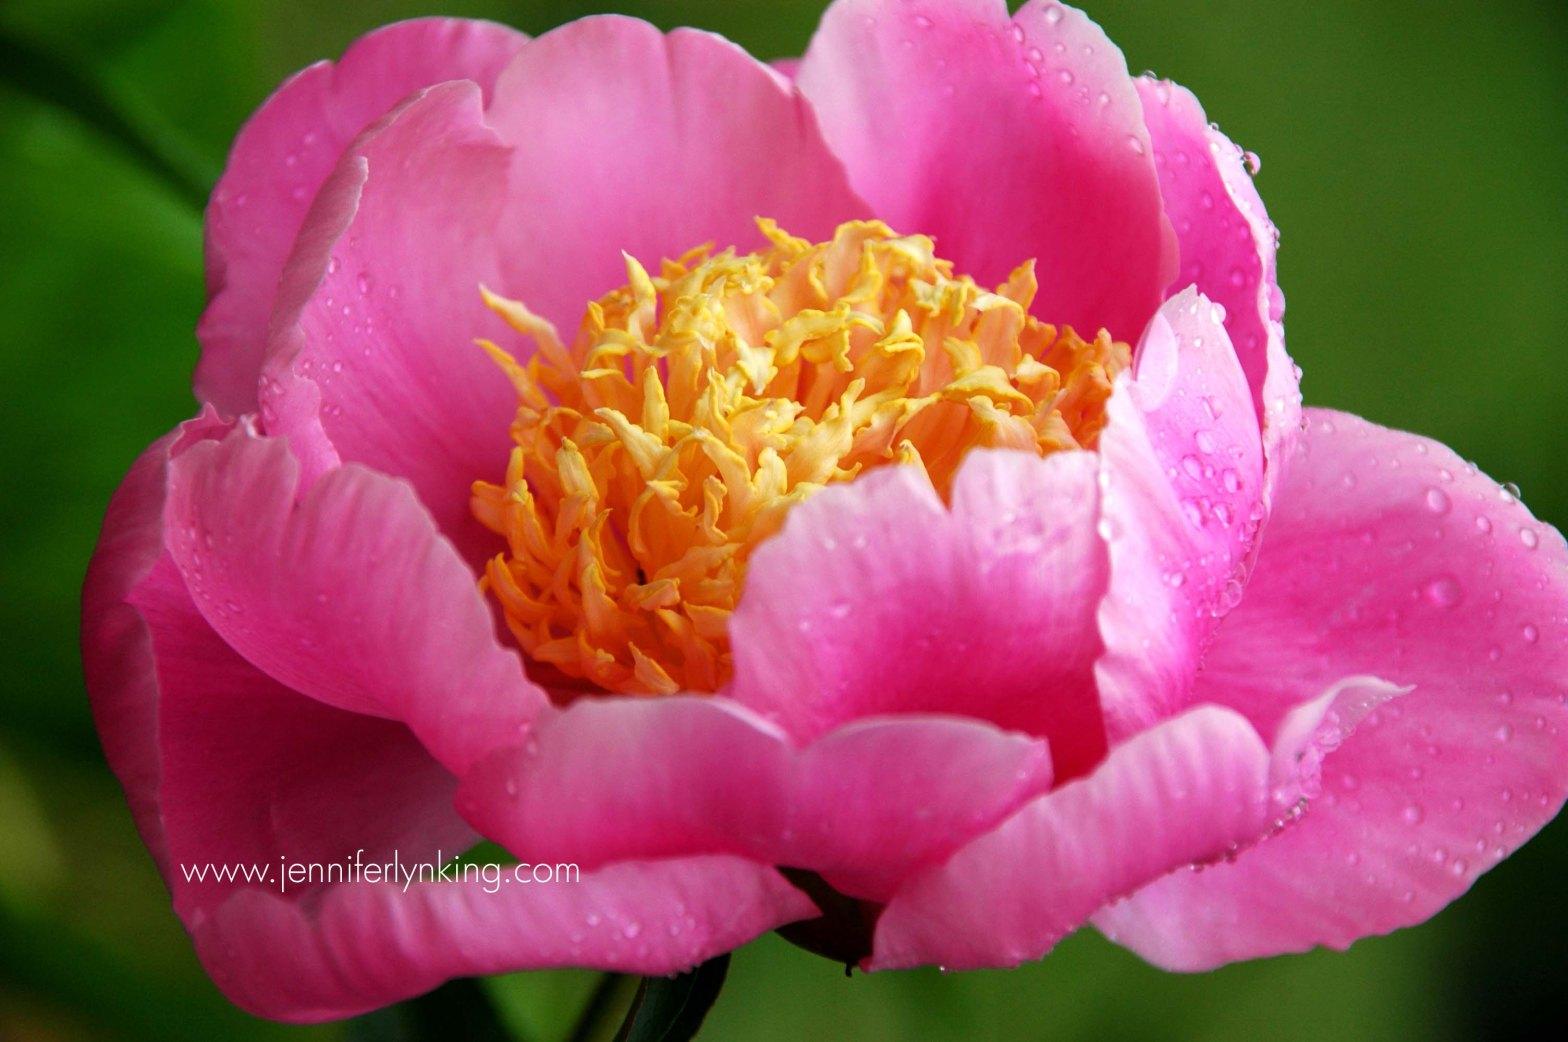 A peony blossom